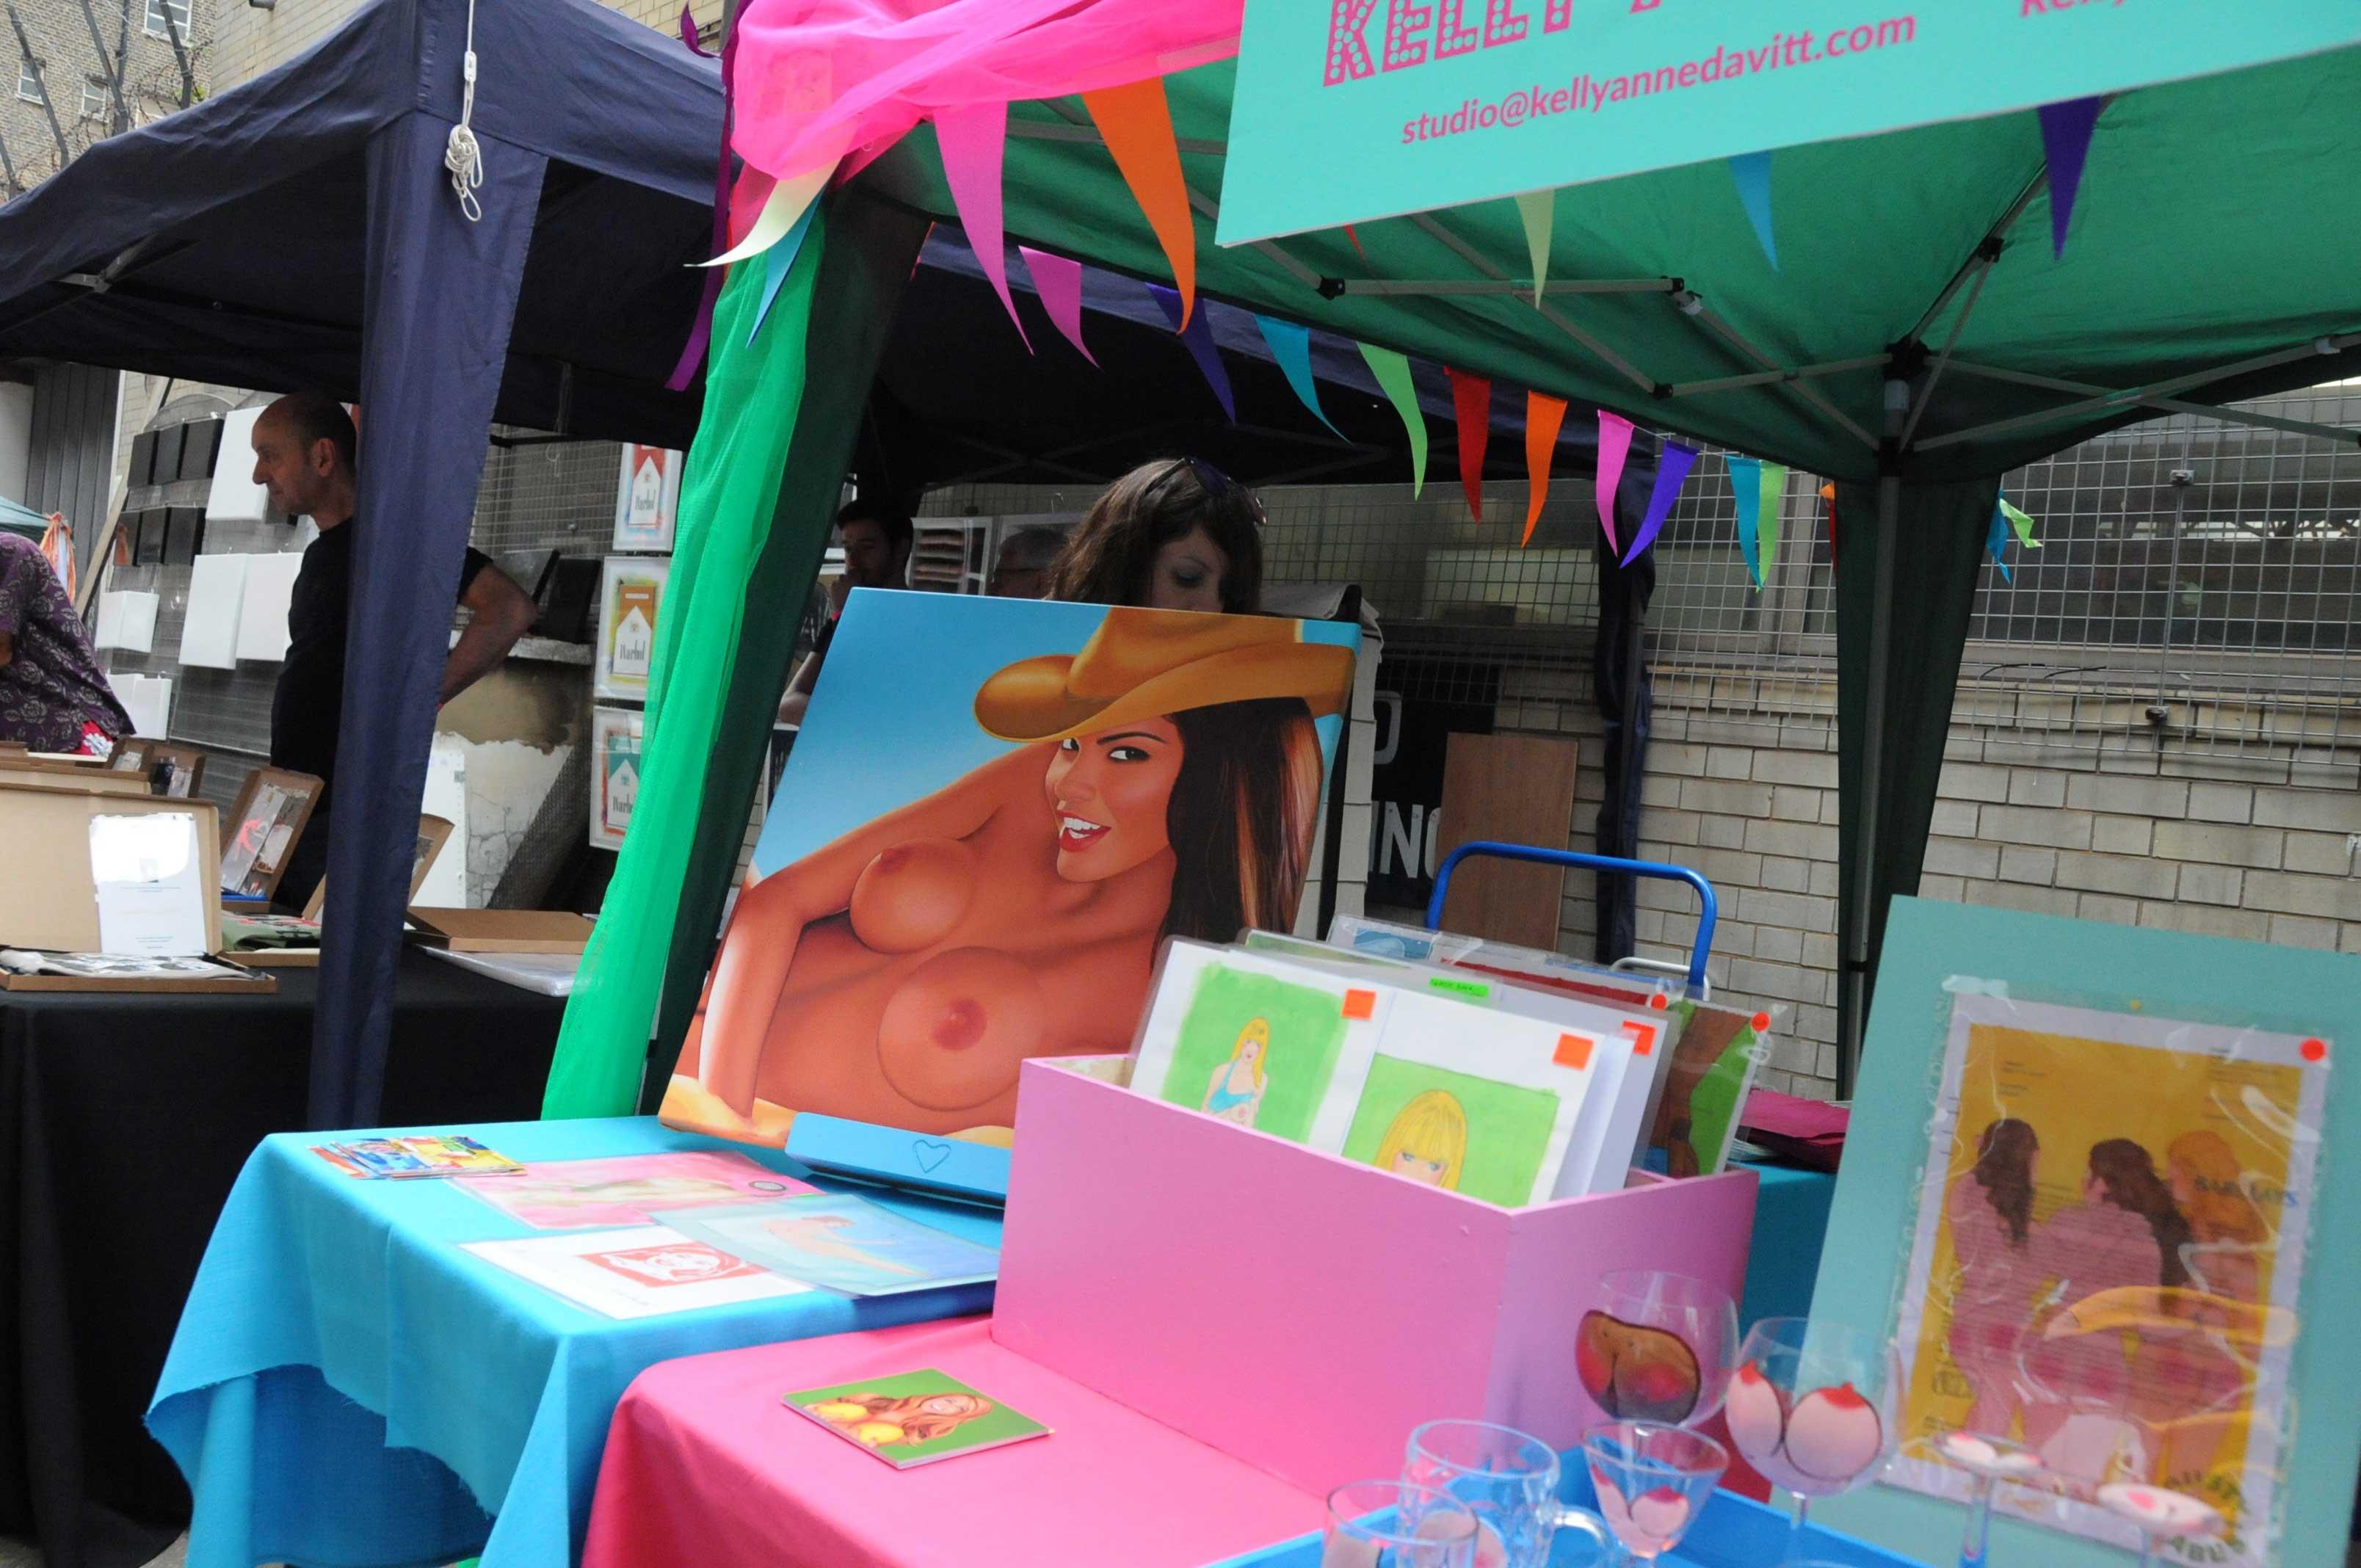 vauxhall art fair market stall in London